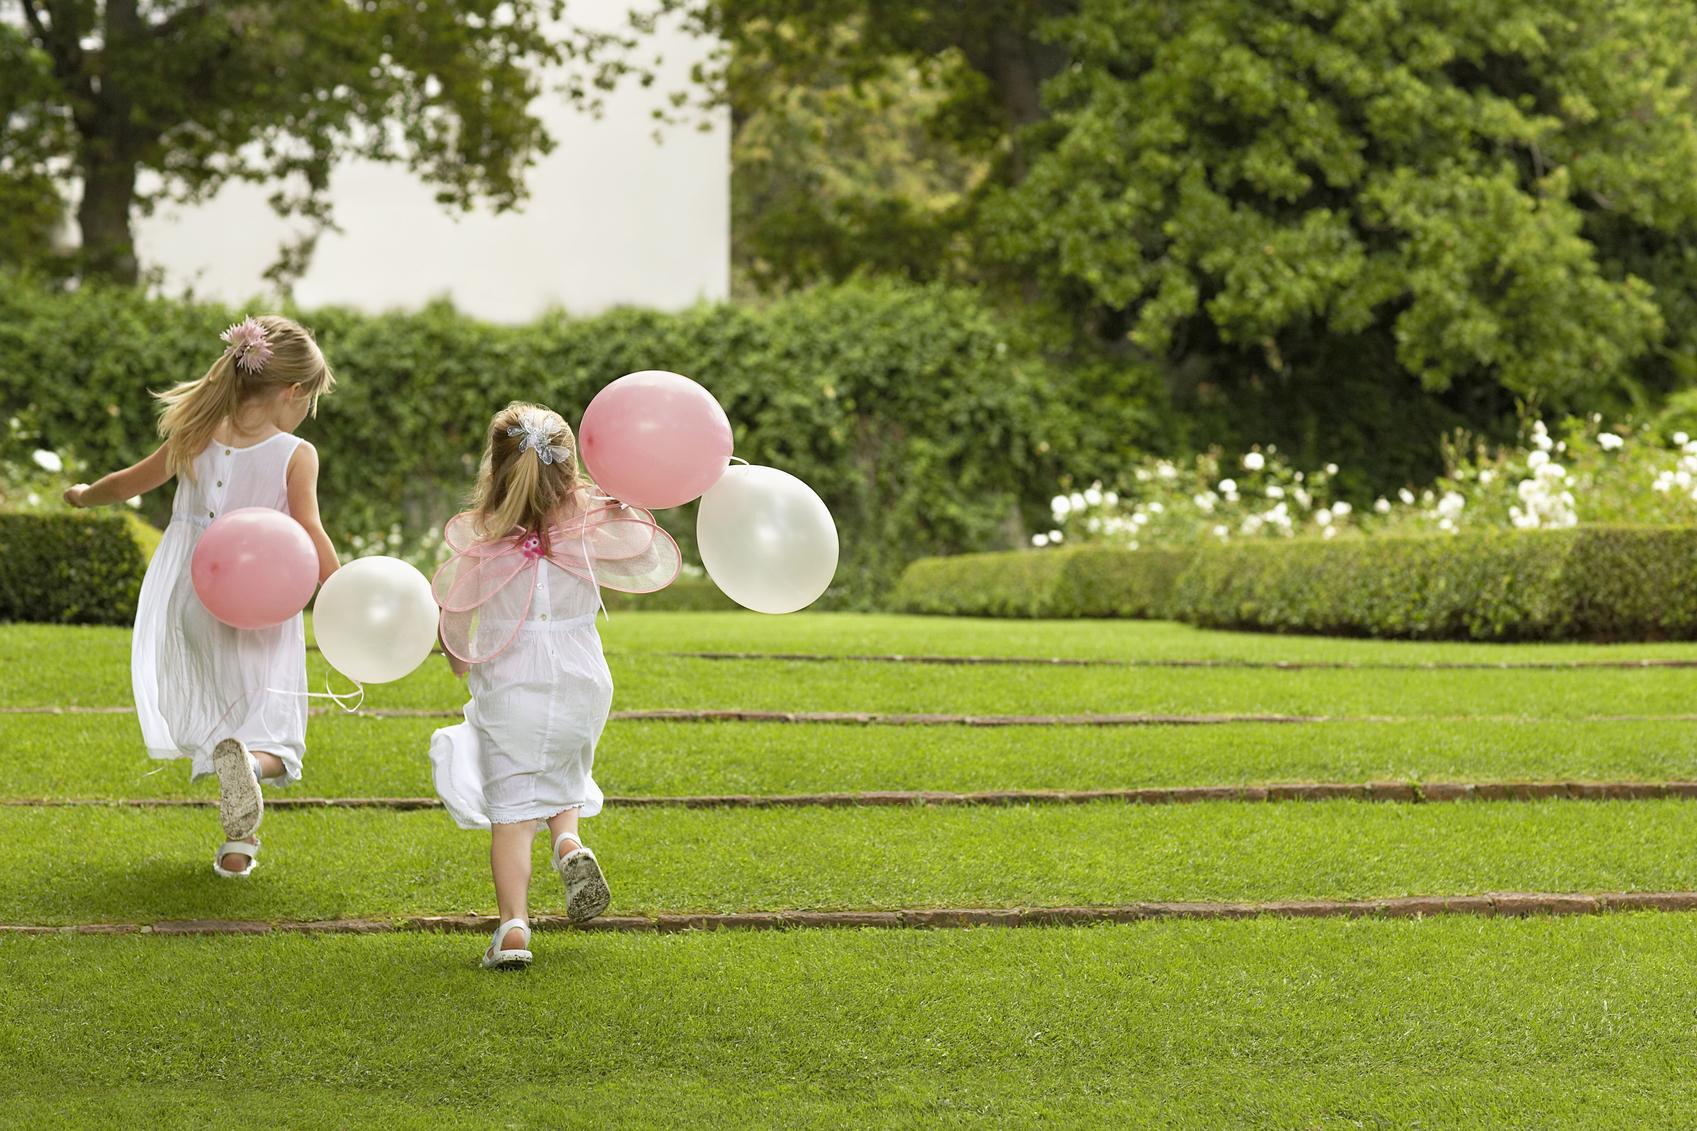 bruidsmeisjes met ballon